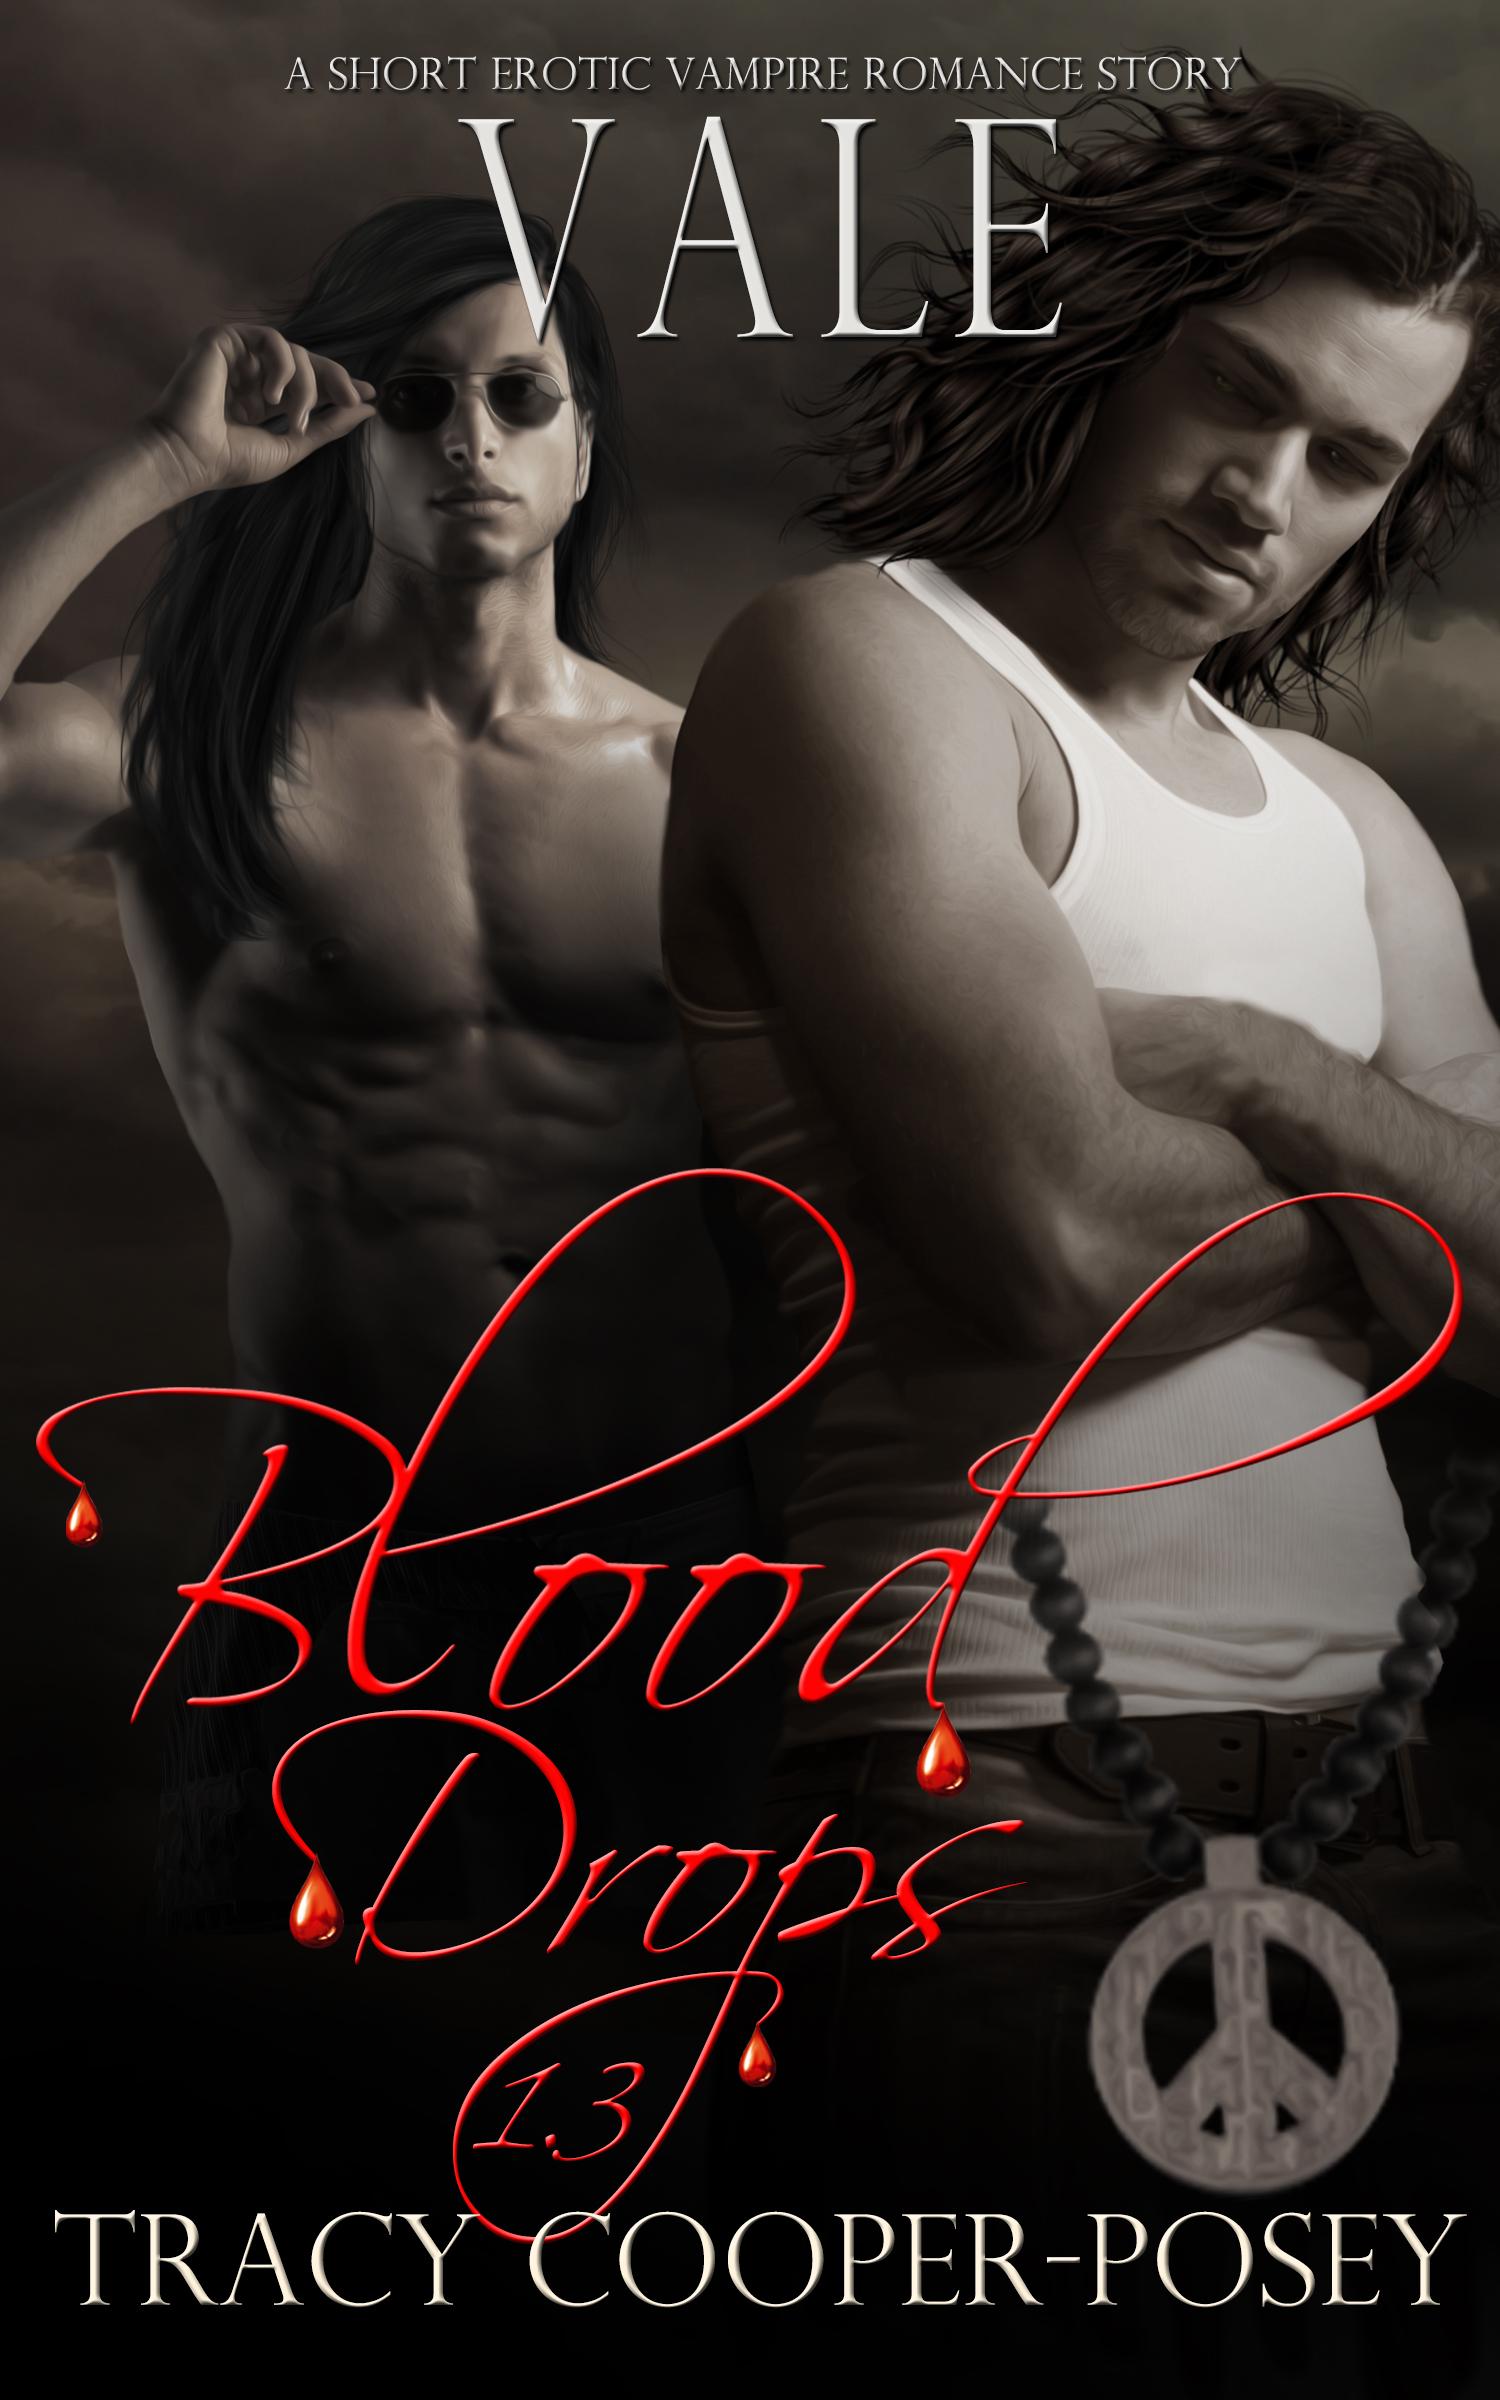 Vampire romance sex hentai image